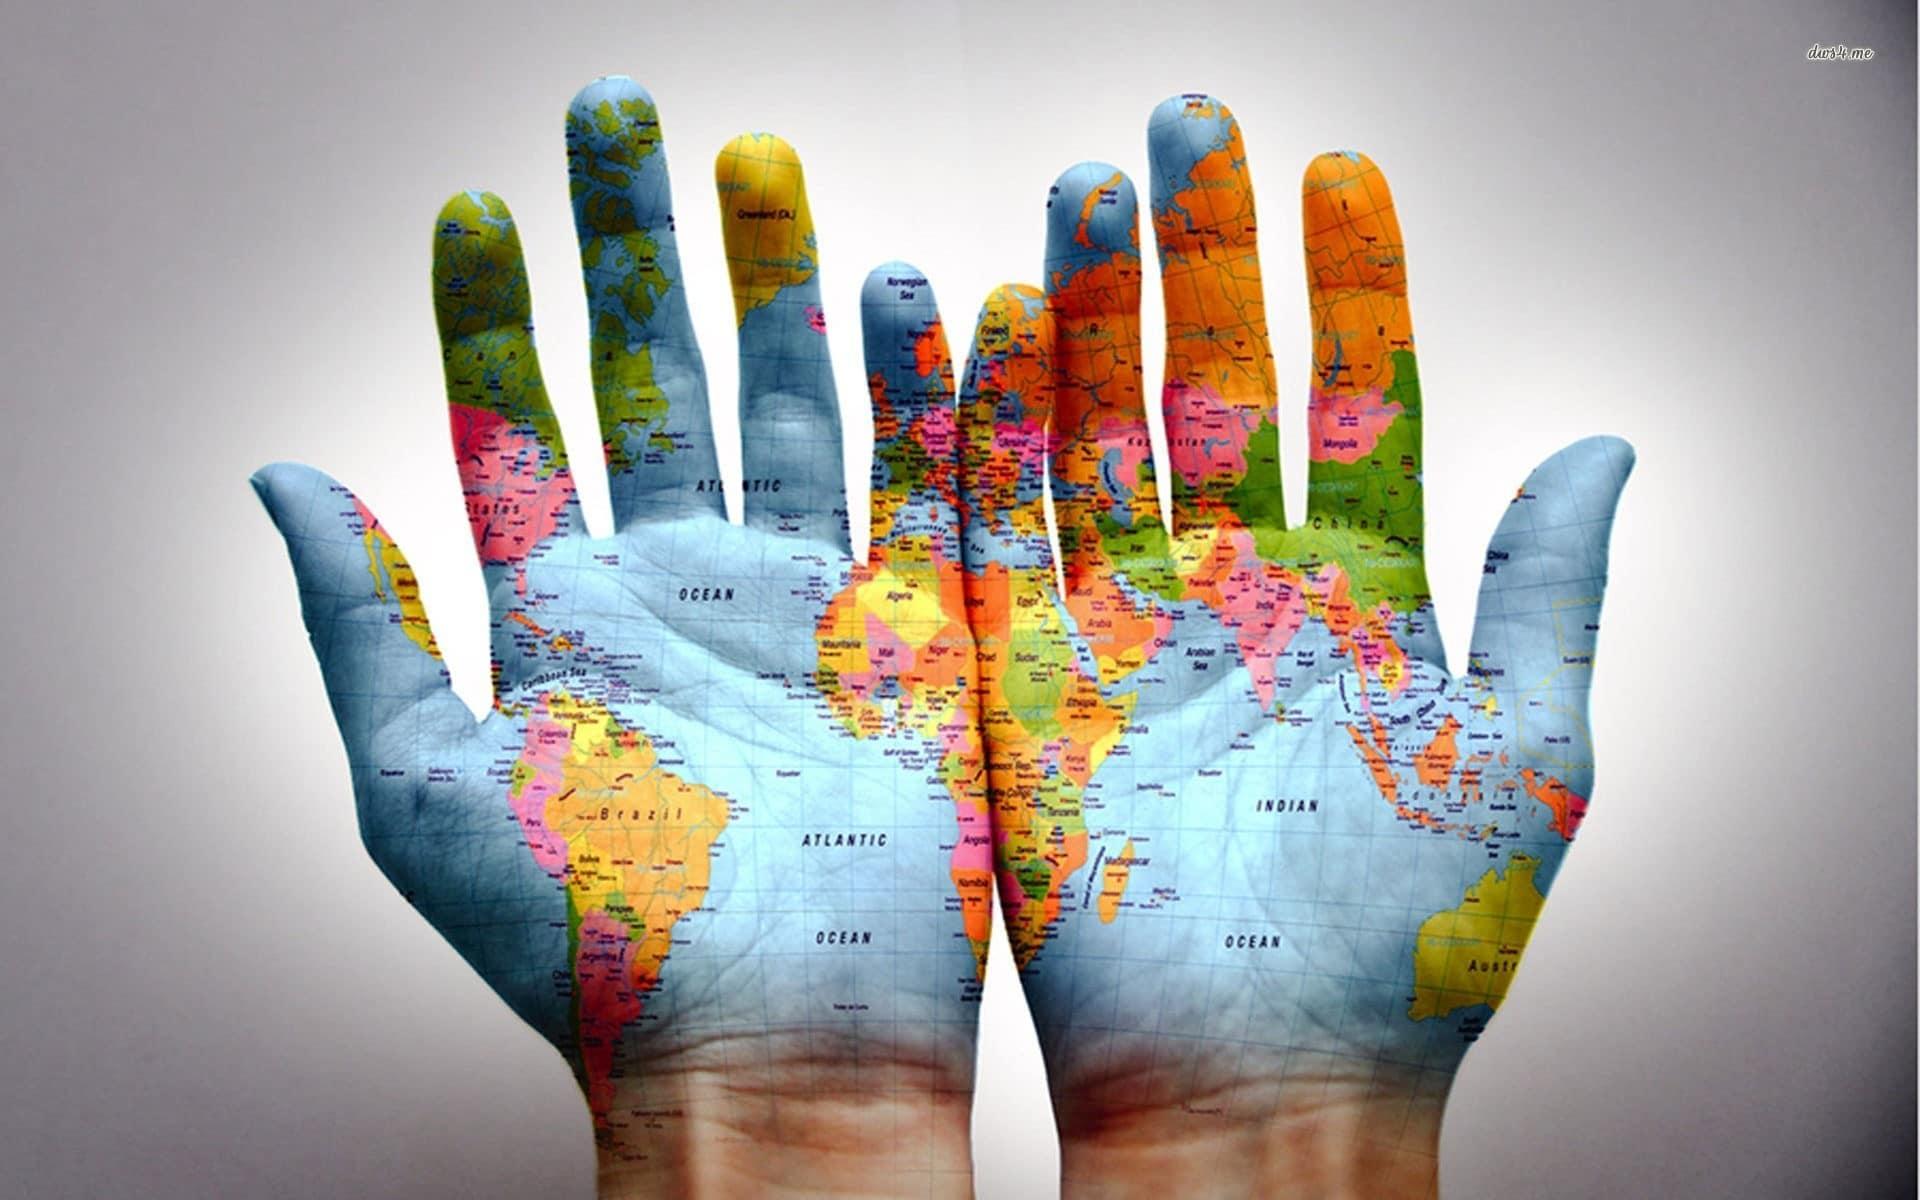 Hult: creating a global world beyond cultural boundaries